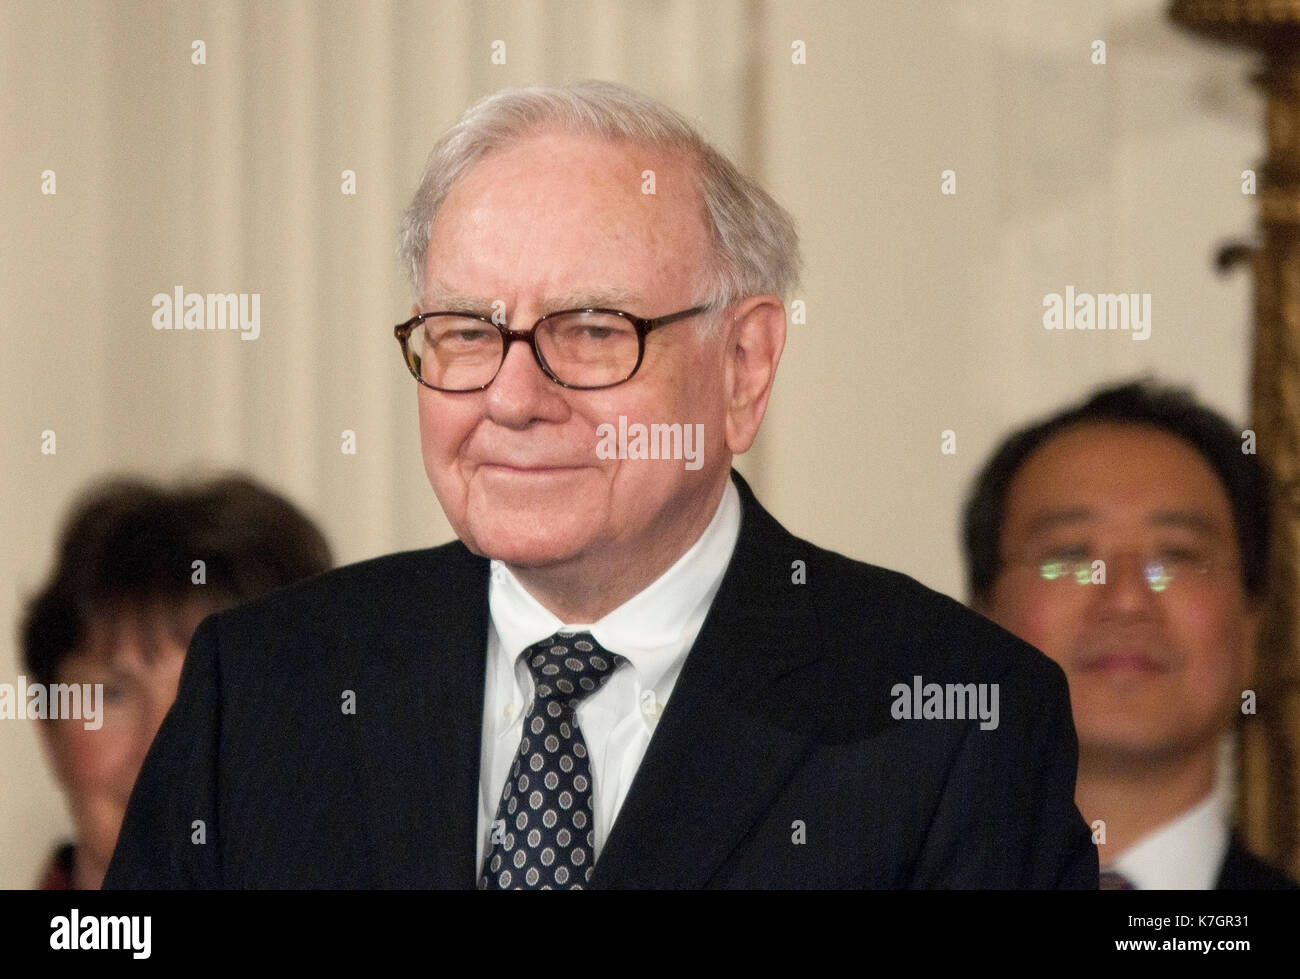 Warren Buffett at the Medal of Freedom ceremony where he was awarded the Medal of Freedom,  Credit: Patsy Lynch/MediaPunch - Stock Image